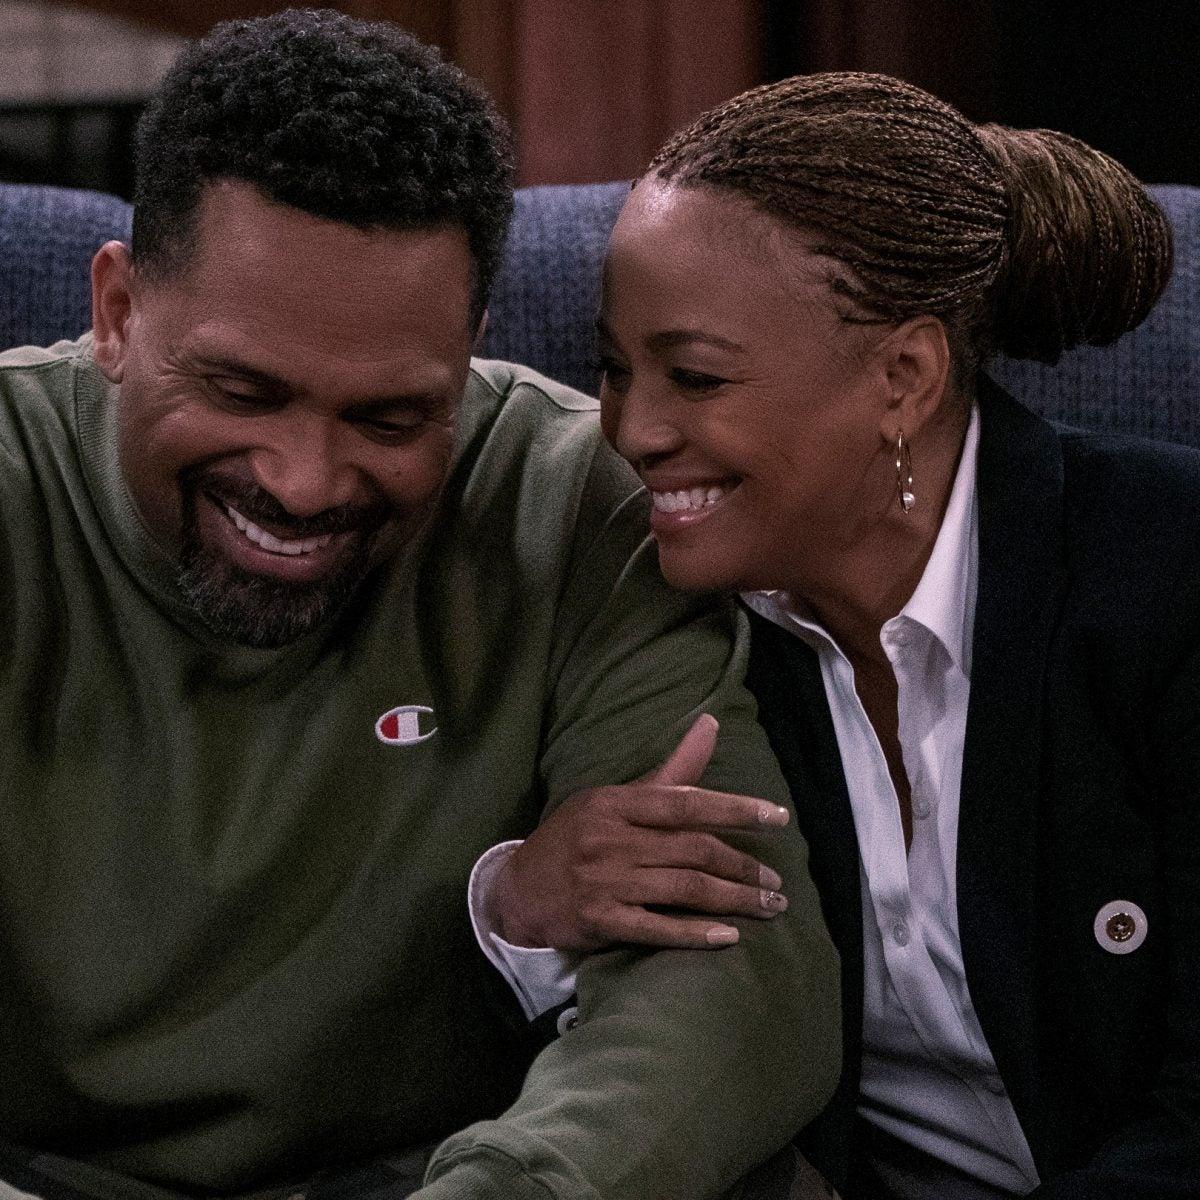 First Look At Netflix's Newest Black Sitcom: 'The Upshaws'